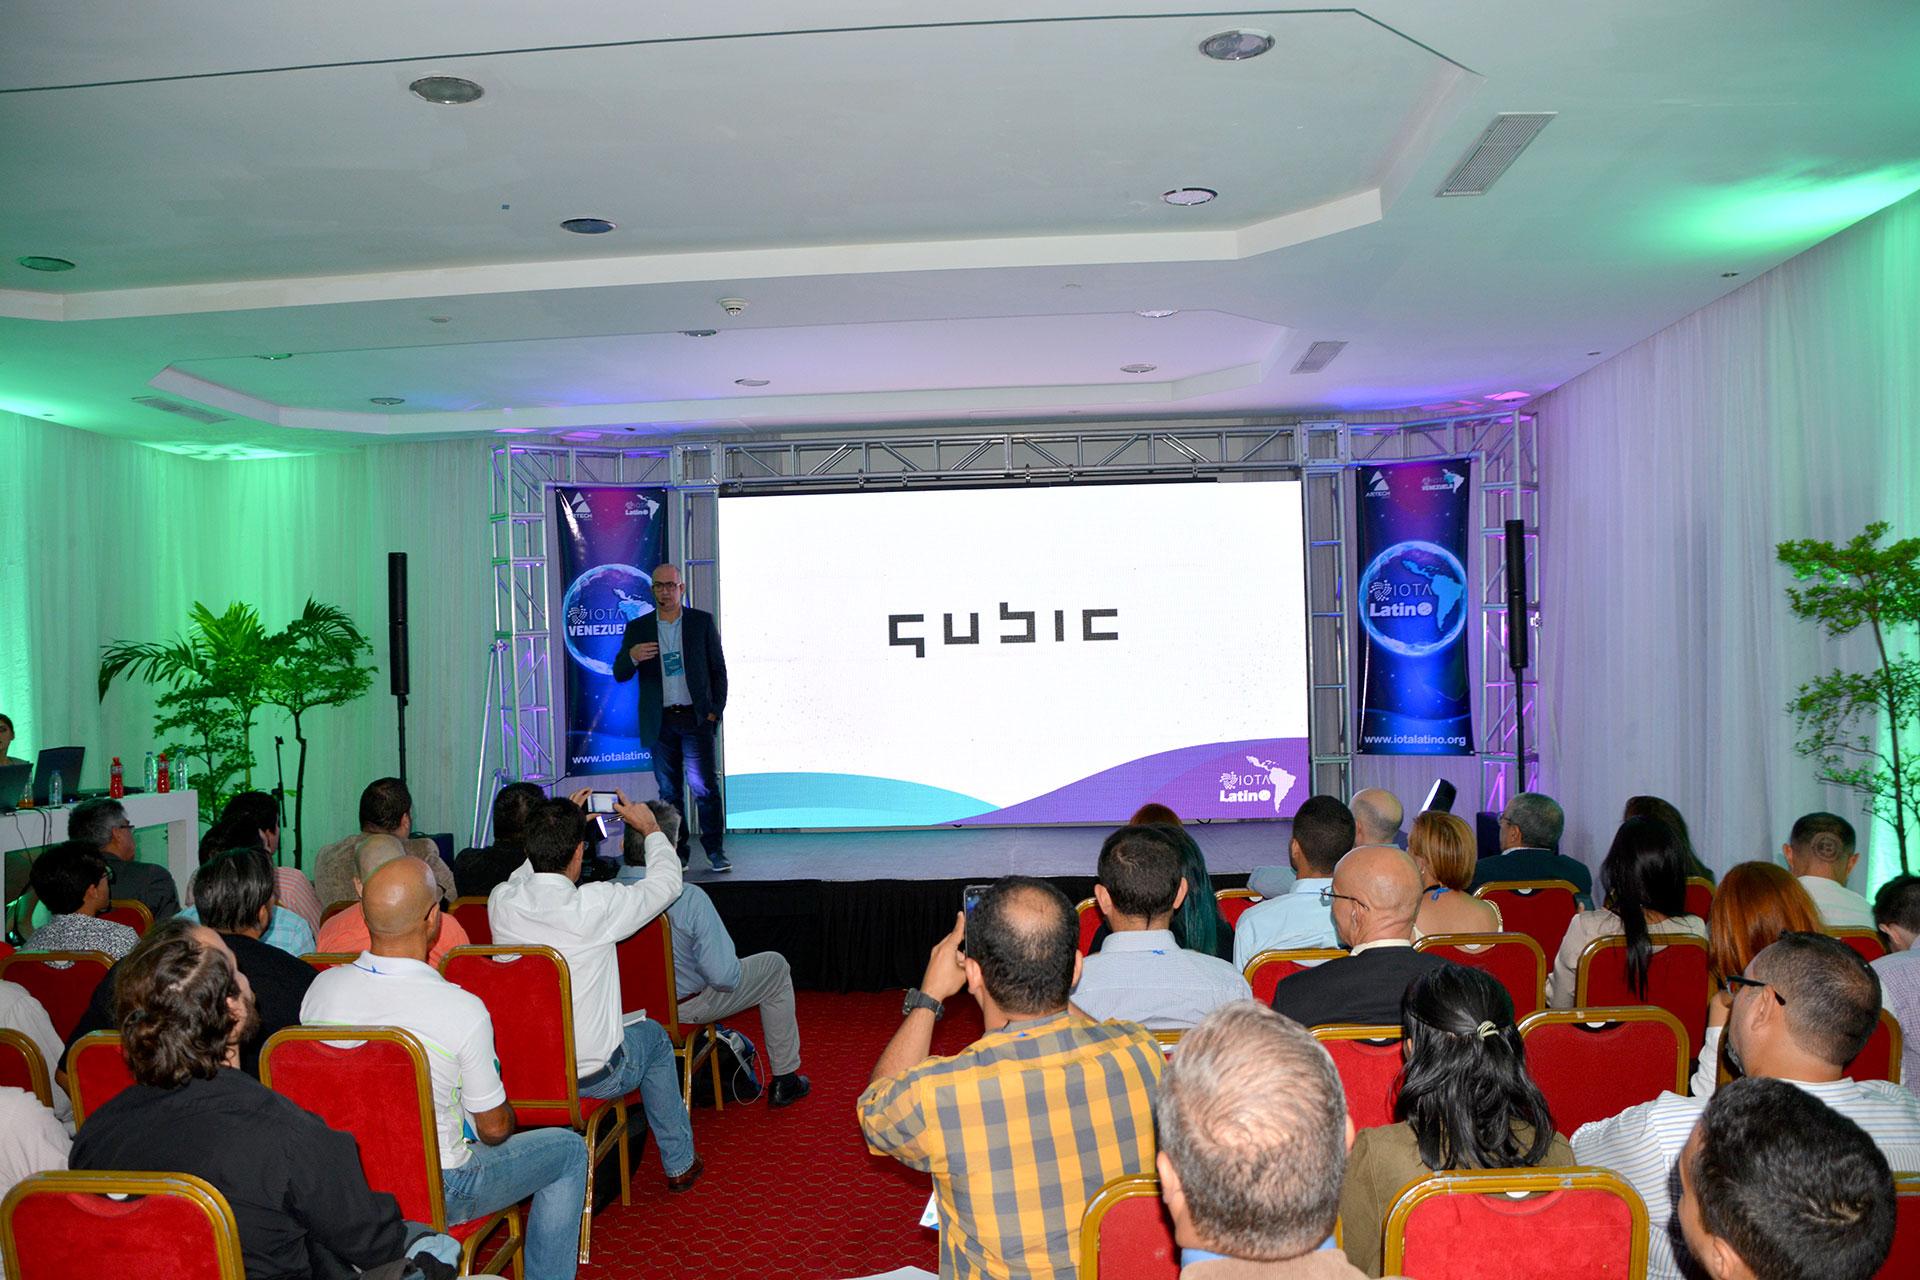 primer meetup de IOTA en Venezuela - Saul Ameliach - 4